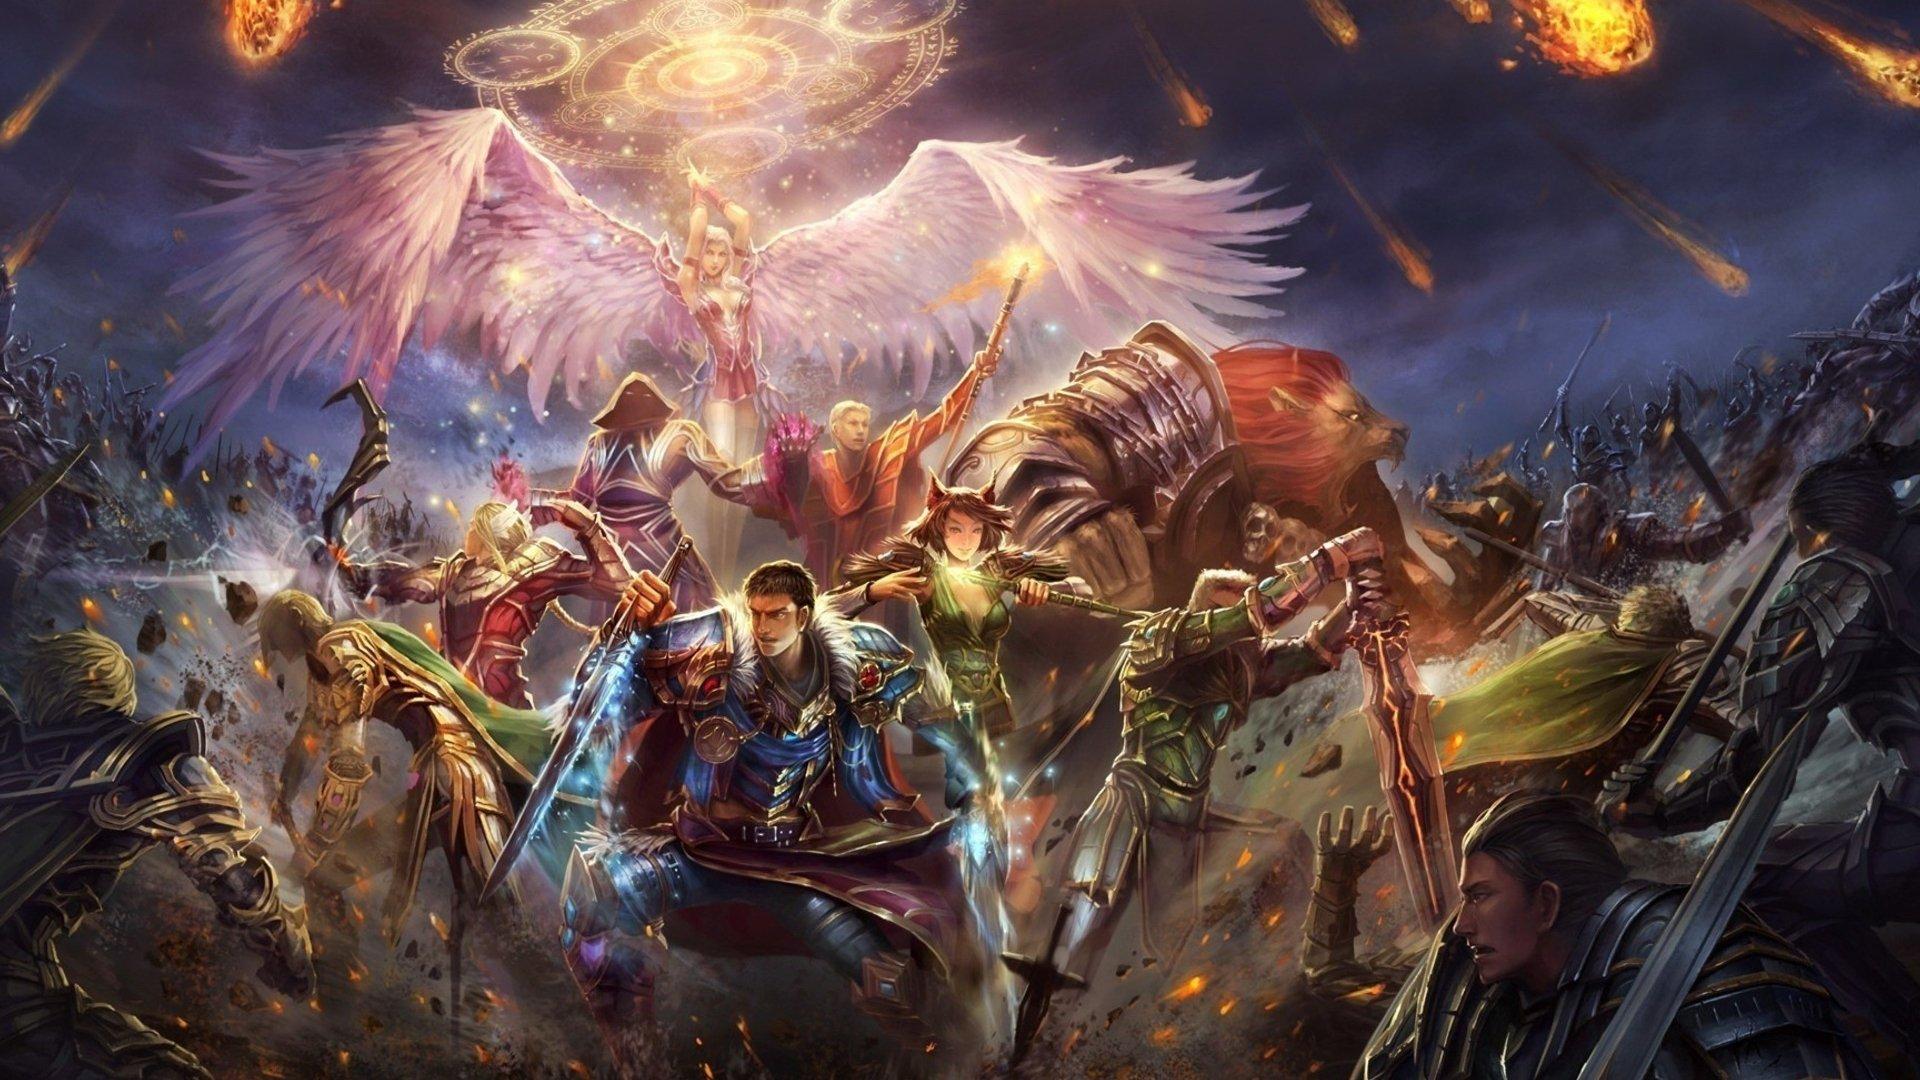 Genji Wallpaper Iphone Epic Battle Fantasy 4 Full Hd Wallpaper And Background